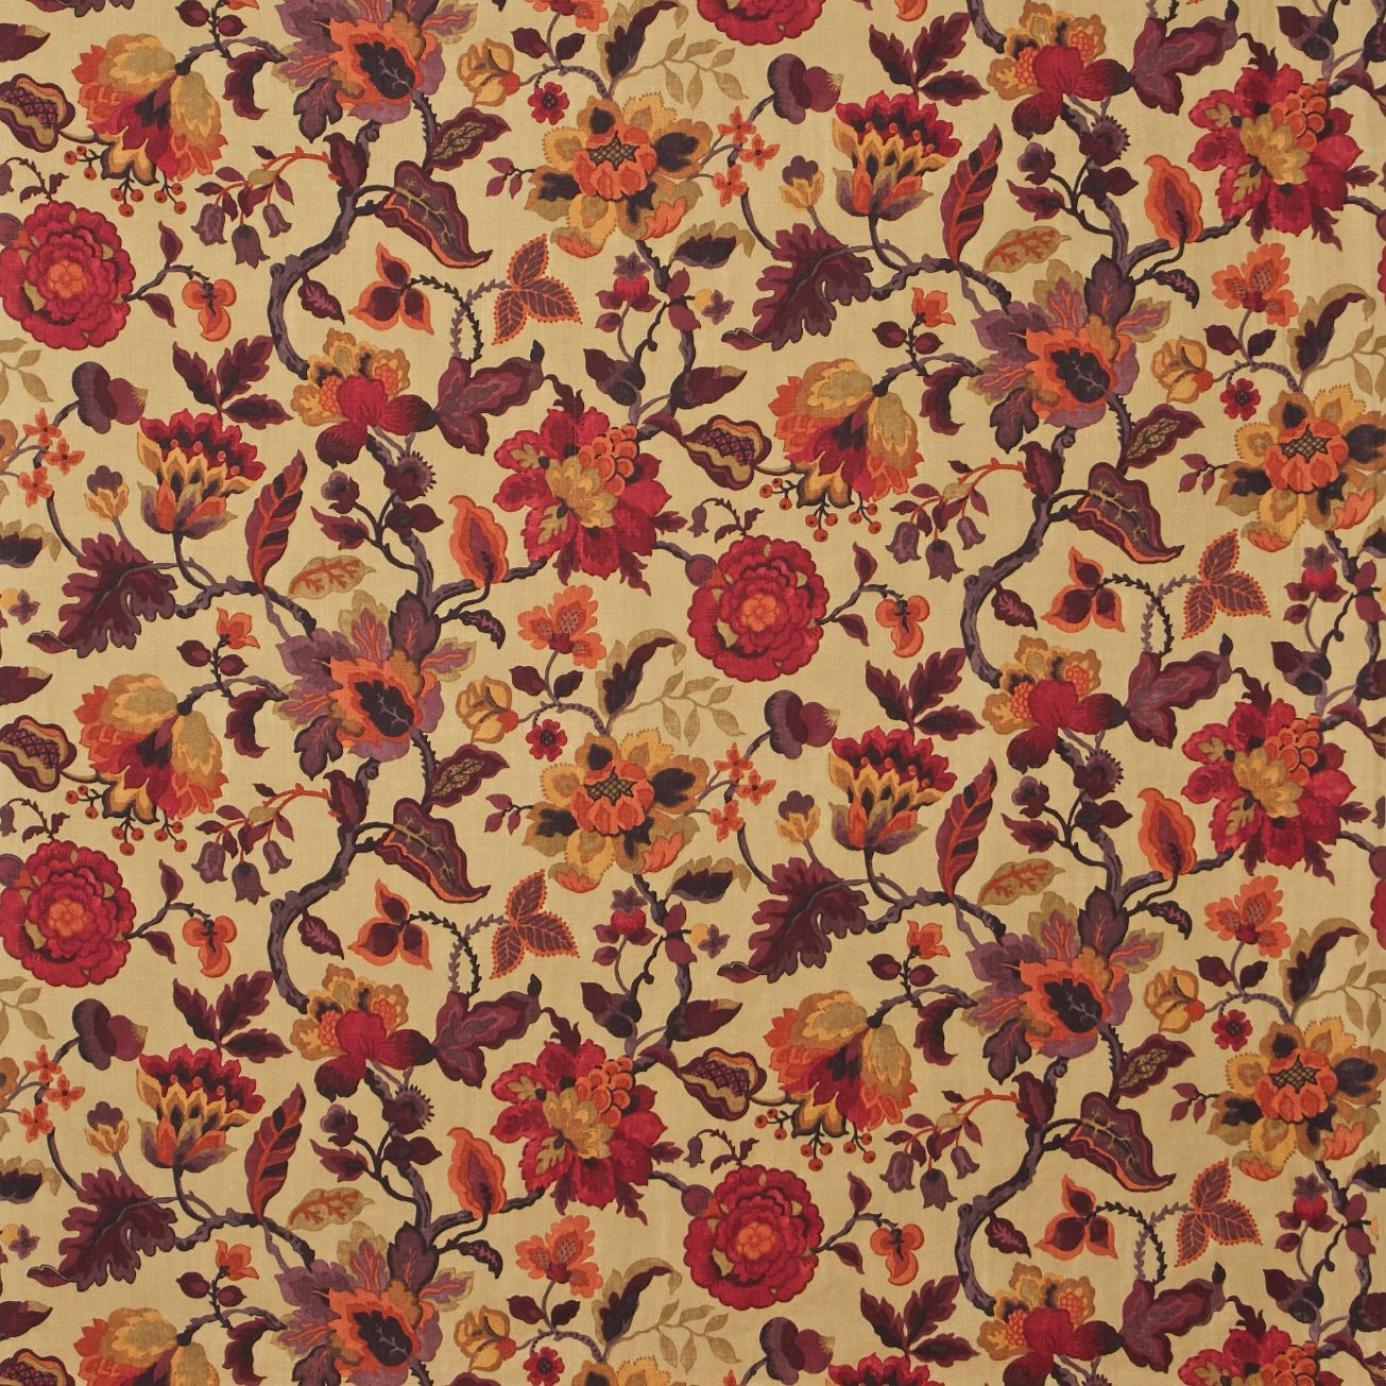 amanpuri fabric old gold aubergine dcouam201. Black Bedroom Furniture Sets. Home Design Ideas